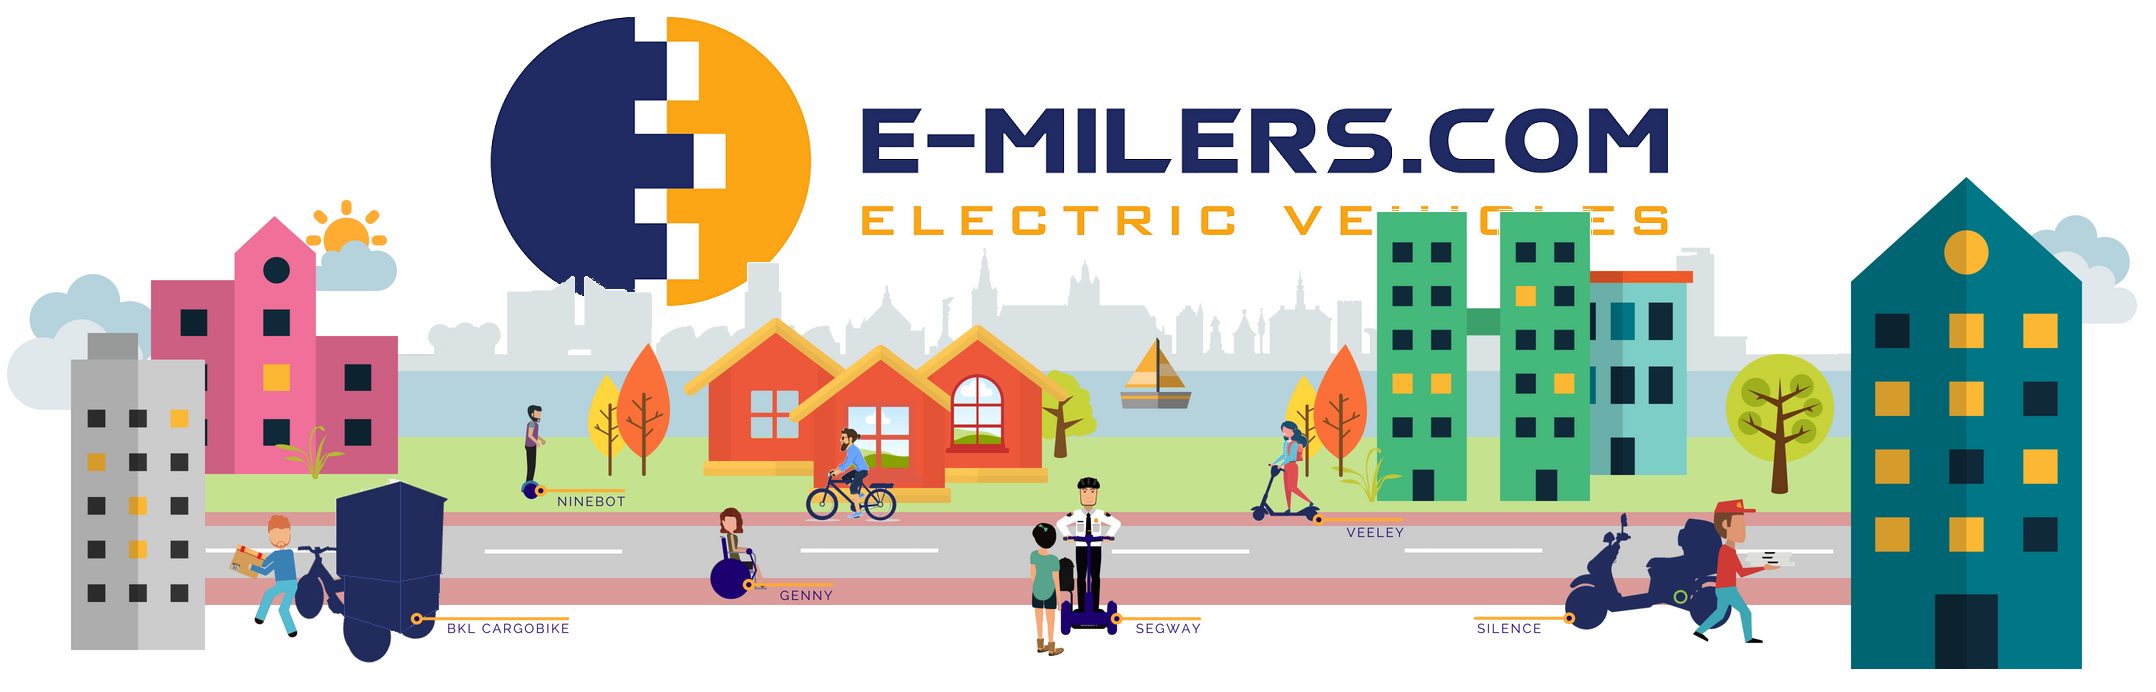 E-Milers-com_world_tekst-logo